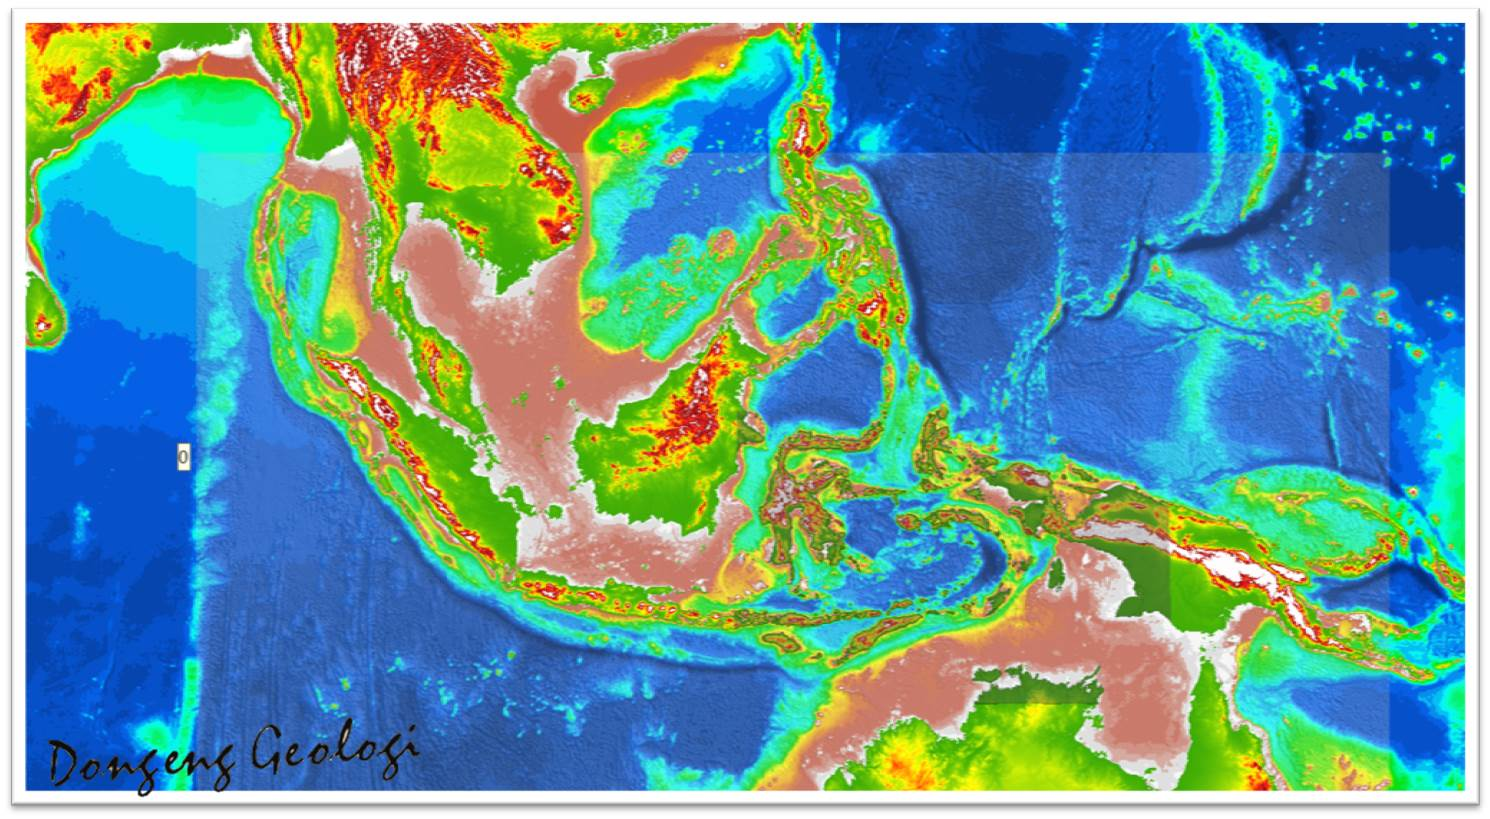 Indonesia merupakan kumpulan berbaai pulau dengan masing masing